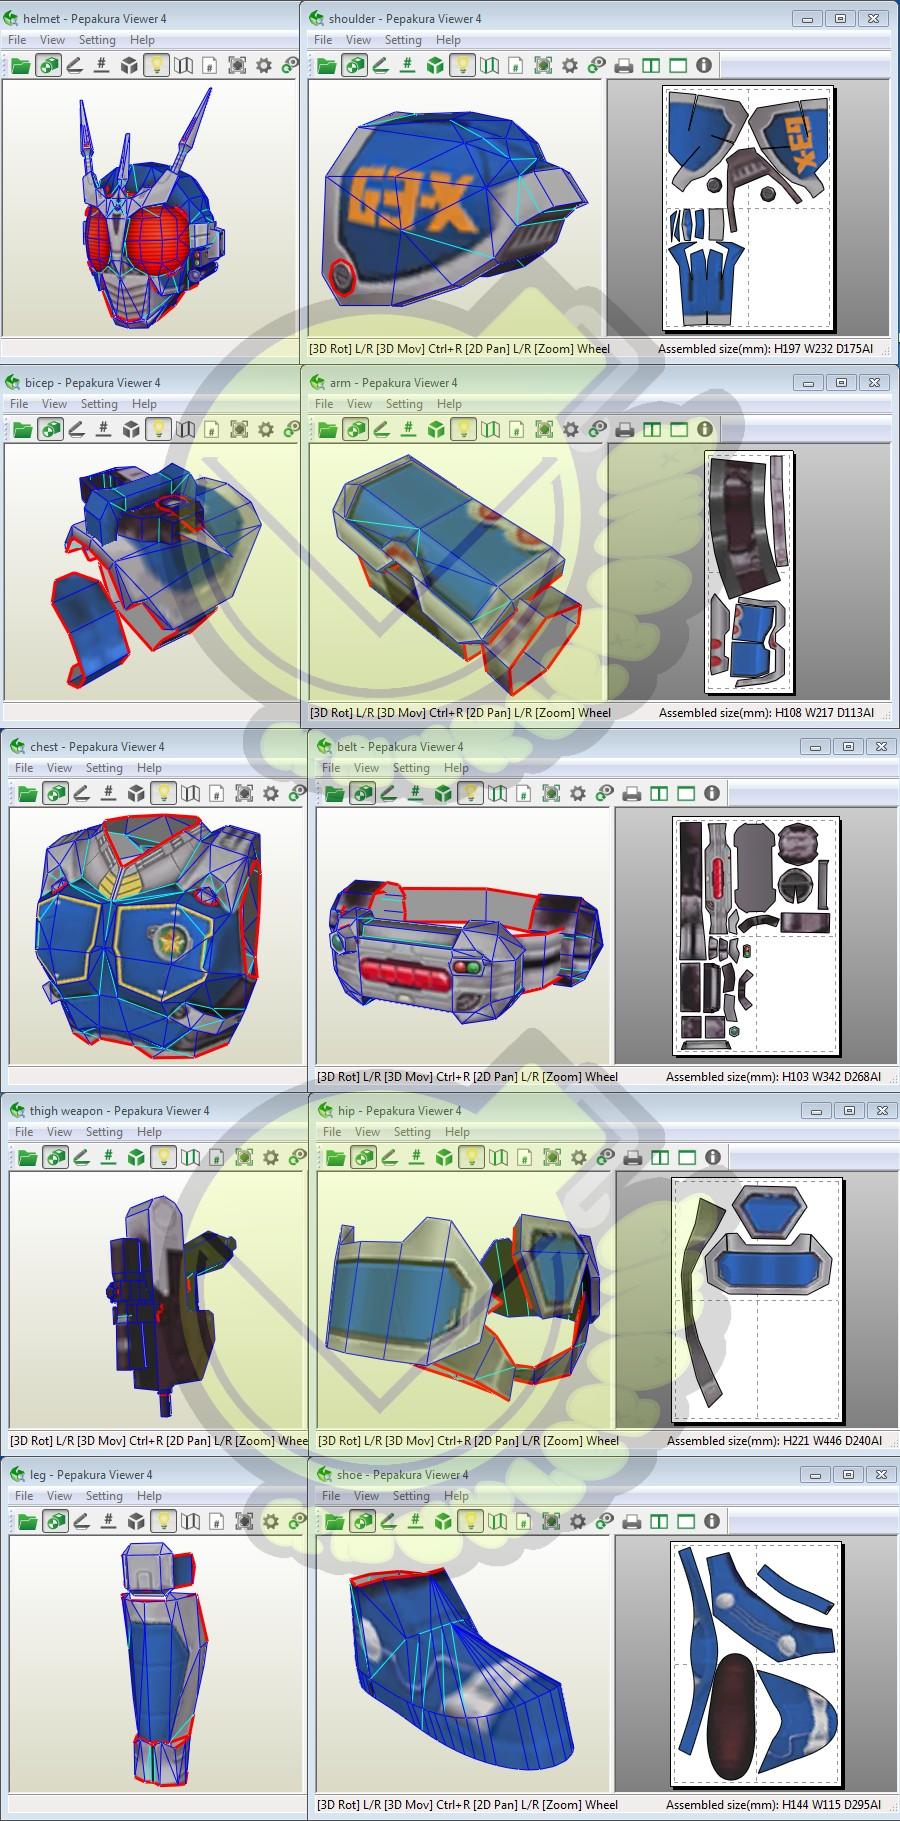 40k Papercraft Kamen Rider G3x Costume Template Pattern Pepakura 3d Model